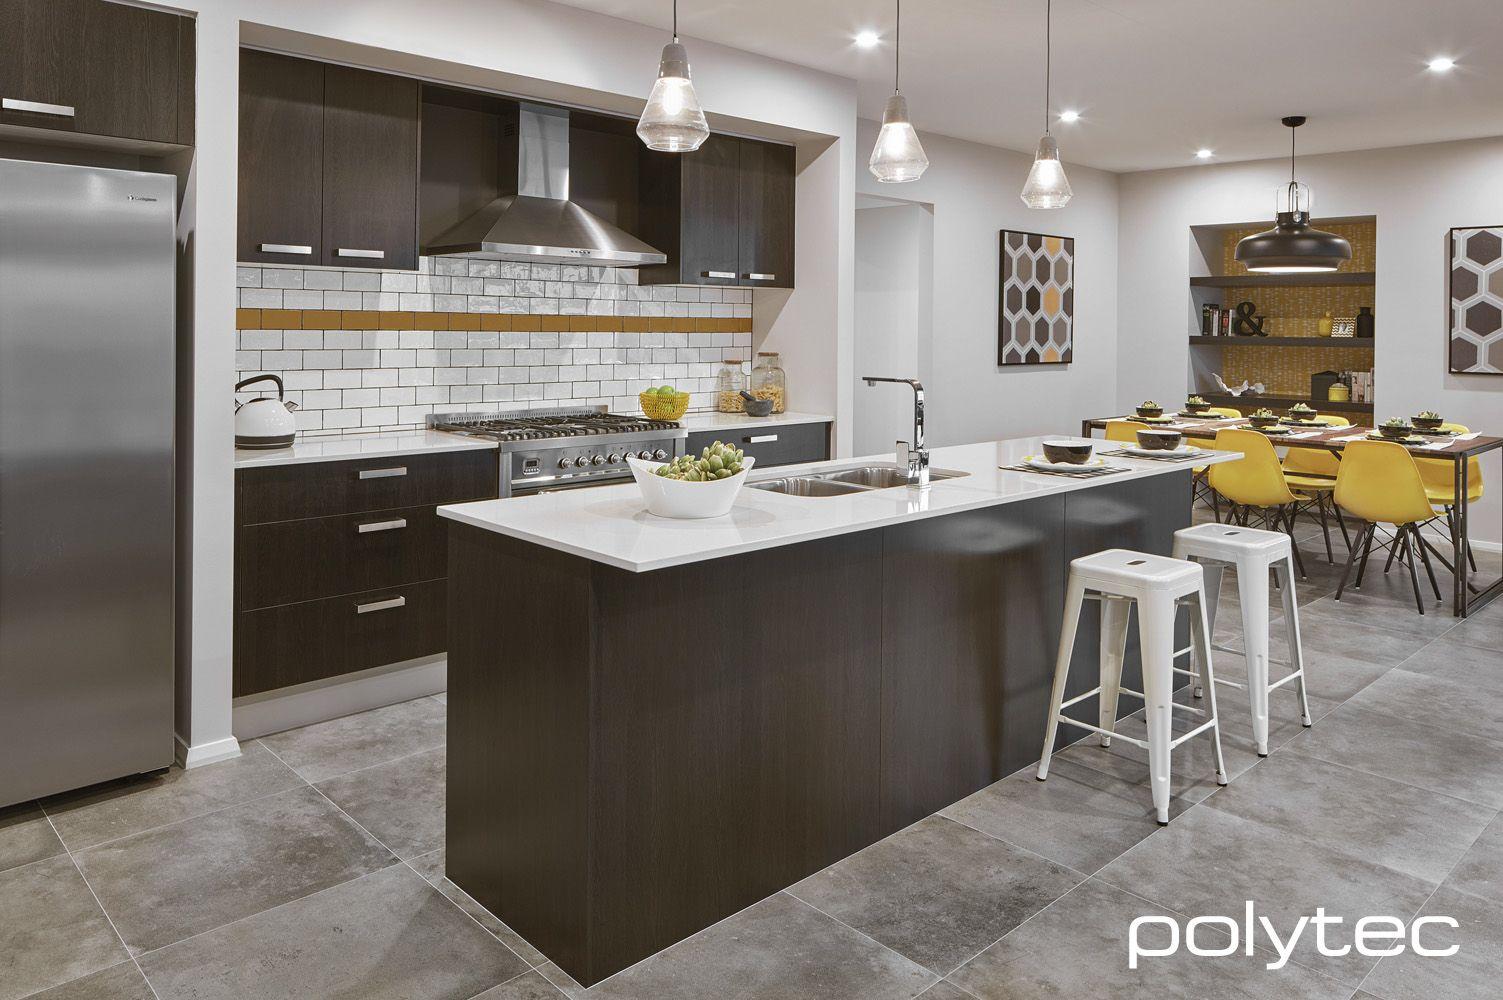 Doors And Bar Panel In Melamine Black Wenge Matt Black Kitchen Decor Kitchen Design Melamine Cabinets